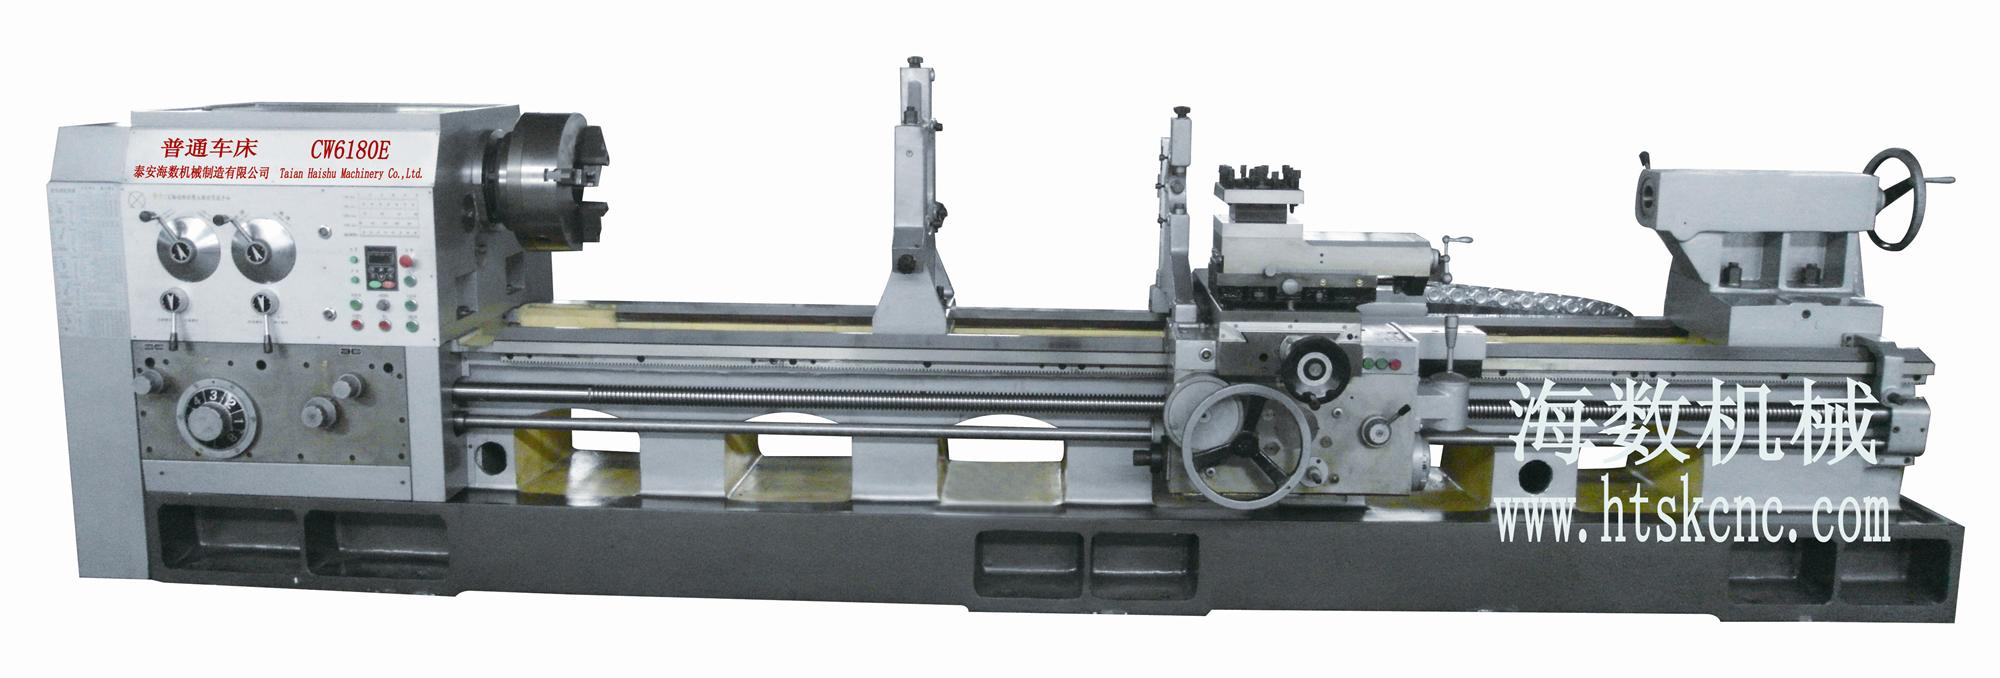 cw6163e/cw6180e普通车床技术参数 项目 项目名称 单位 cw6163e cw